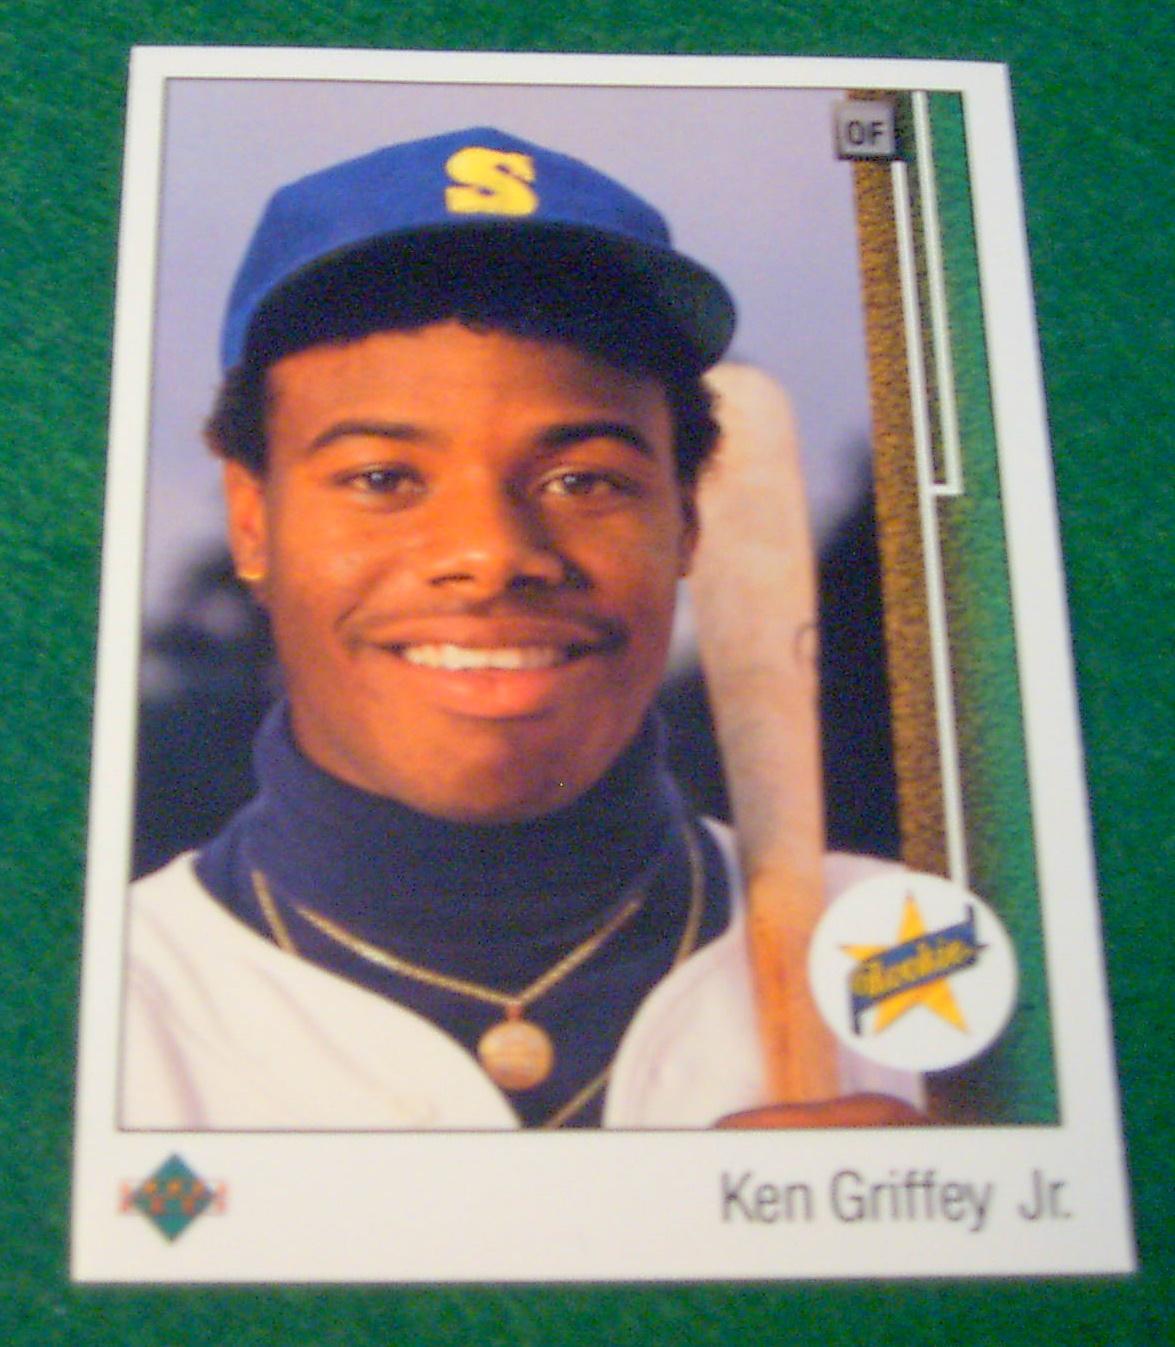 1989 Upper Deck Ken Griffey Jr Rookie Card , Corner Store